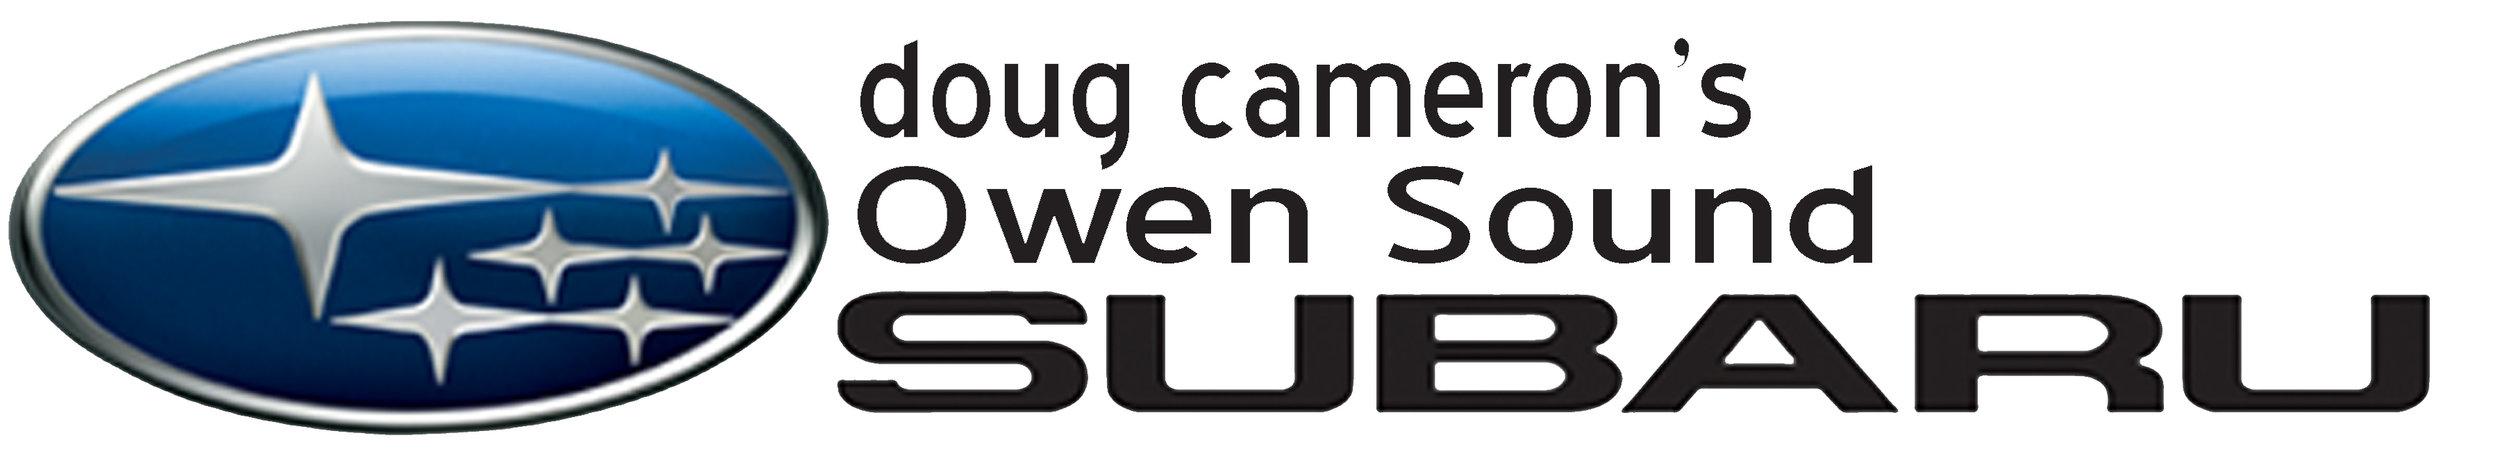 owen-sound-subaru-logo.jpg